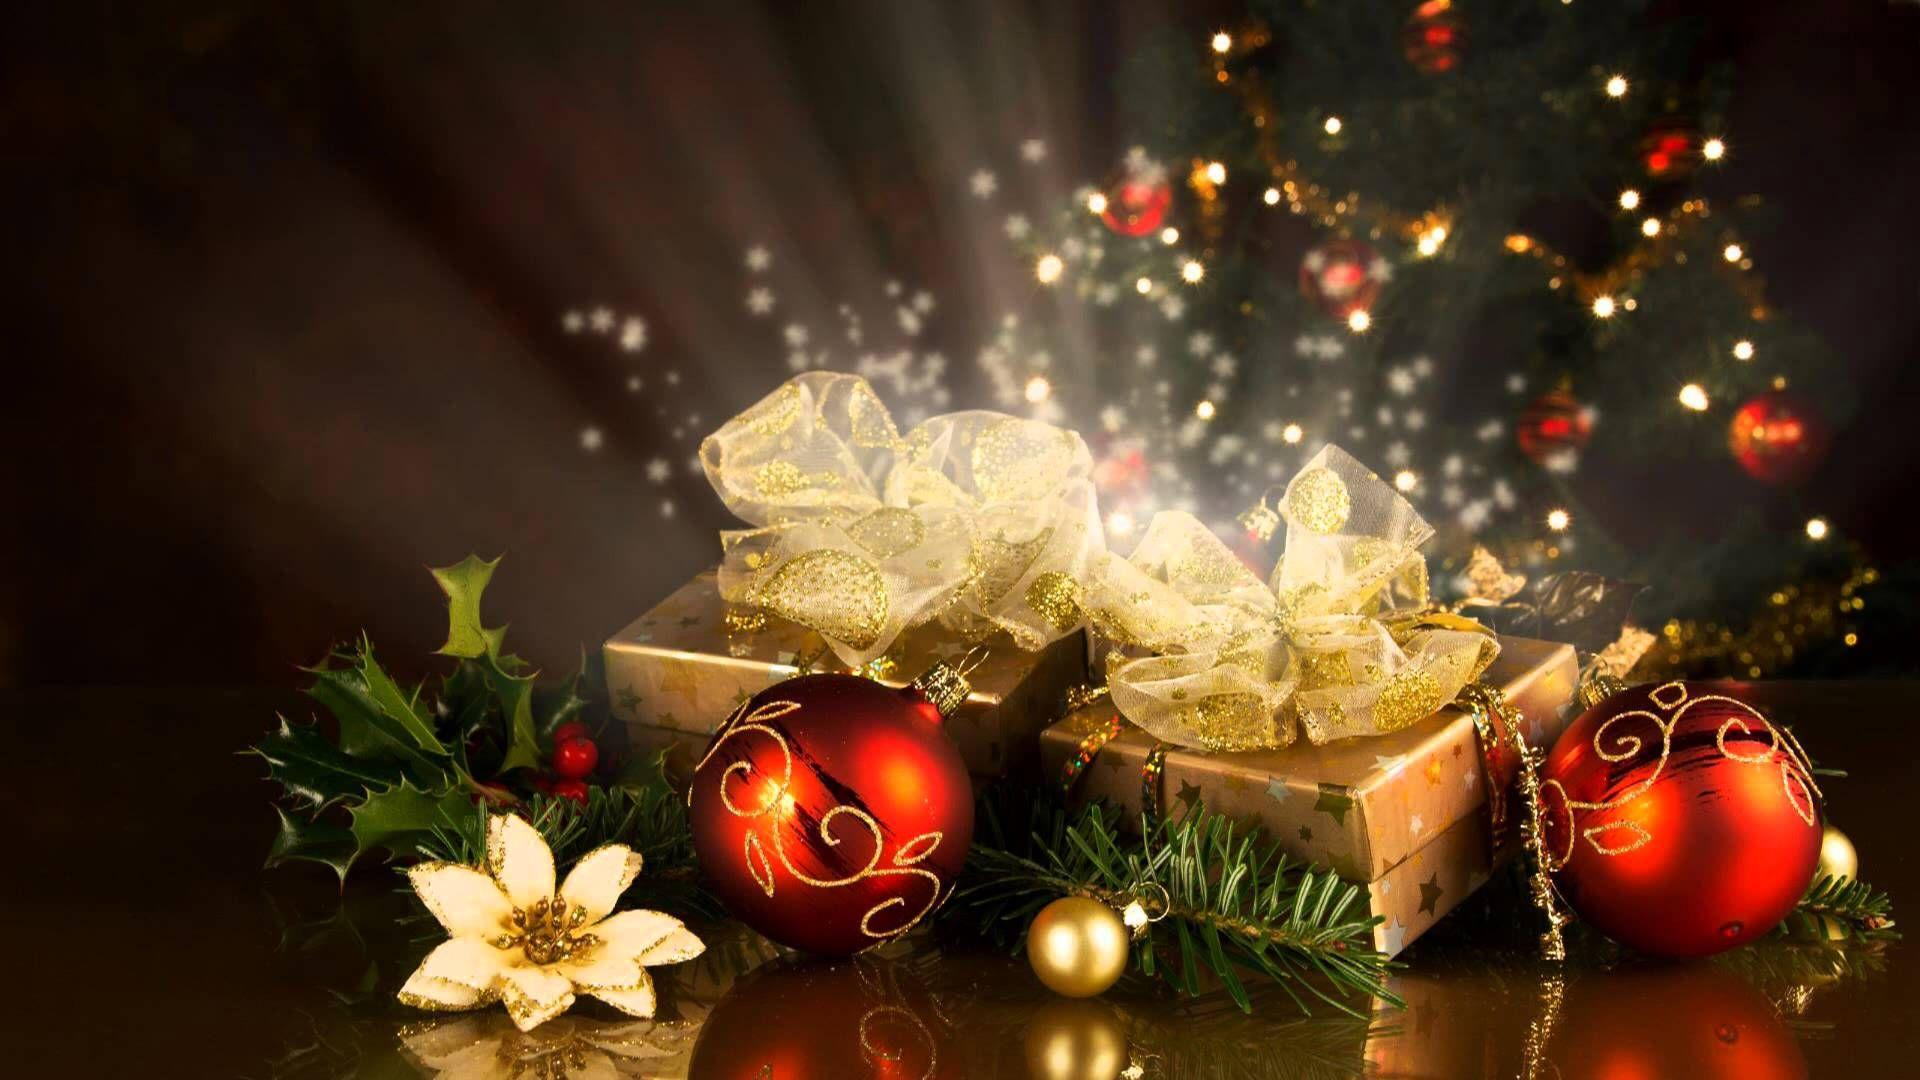 Amazing Wallpaper Music Christmas - 333d4b3e0ad4202d16ae01abe71518eb  Collection_446960.jpg